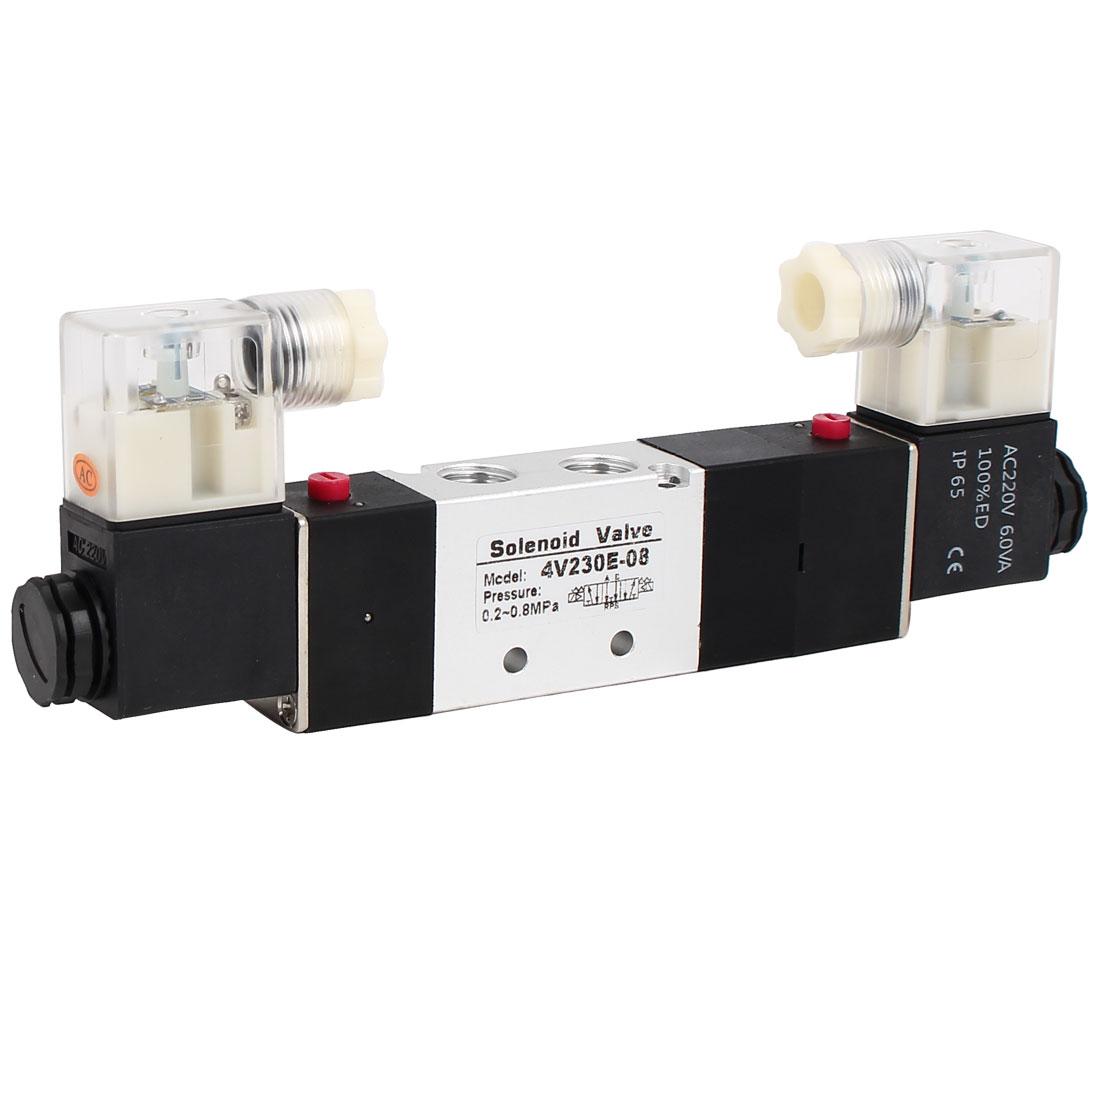 AC 220V 3 Position 5 Way Neutral Electric Solenoid Air Control Valve 4V230E-08